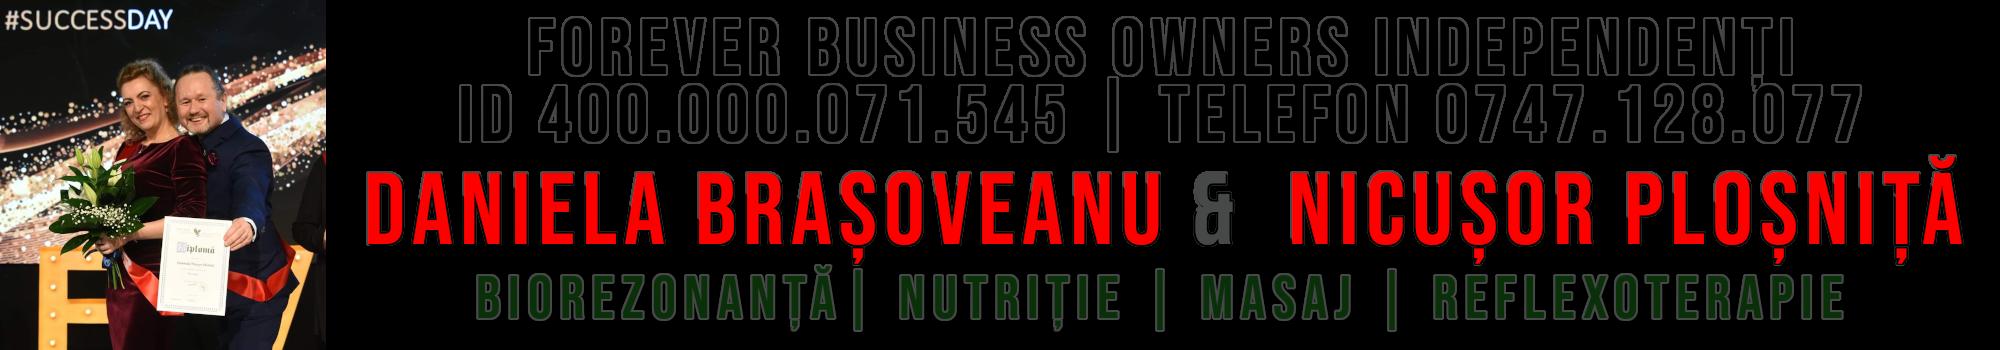 gentlemans pridecardio healthdaniela brasoveanu nicusor plosnita manageri flp forever living products business bacau